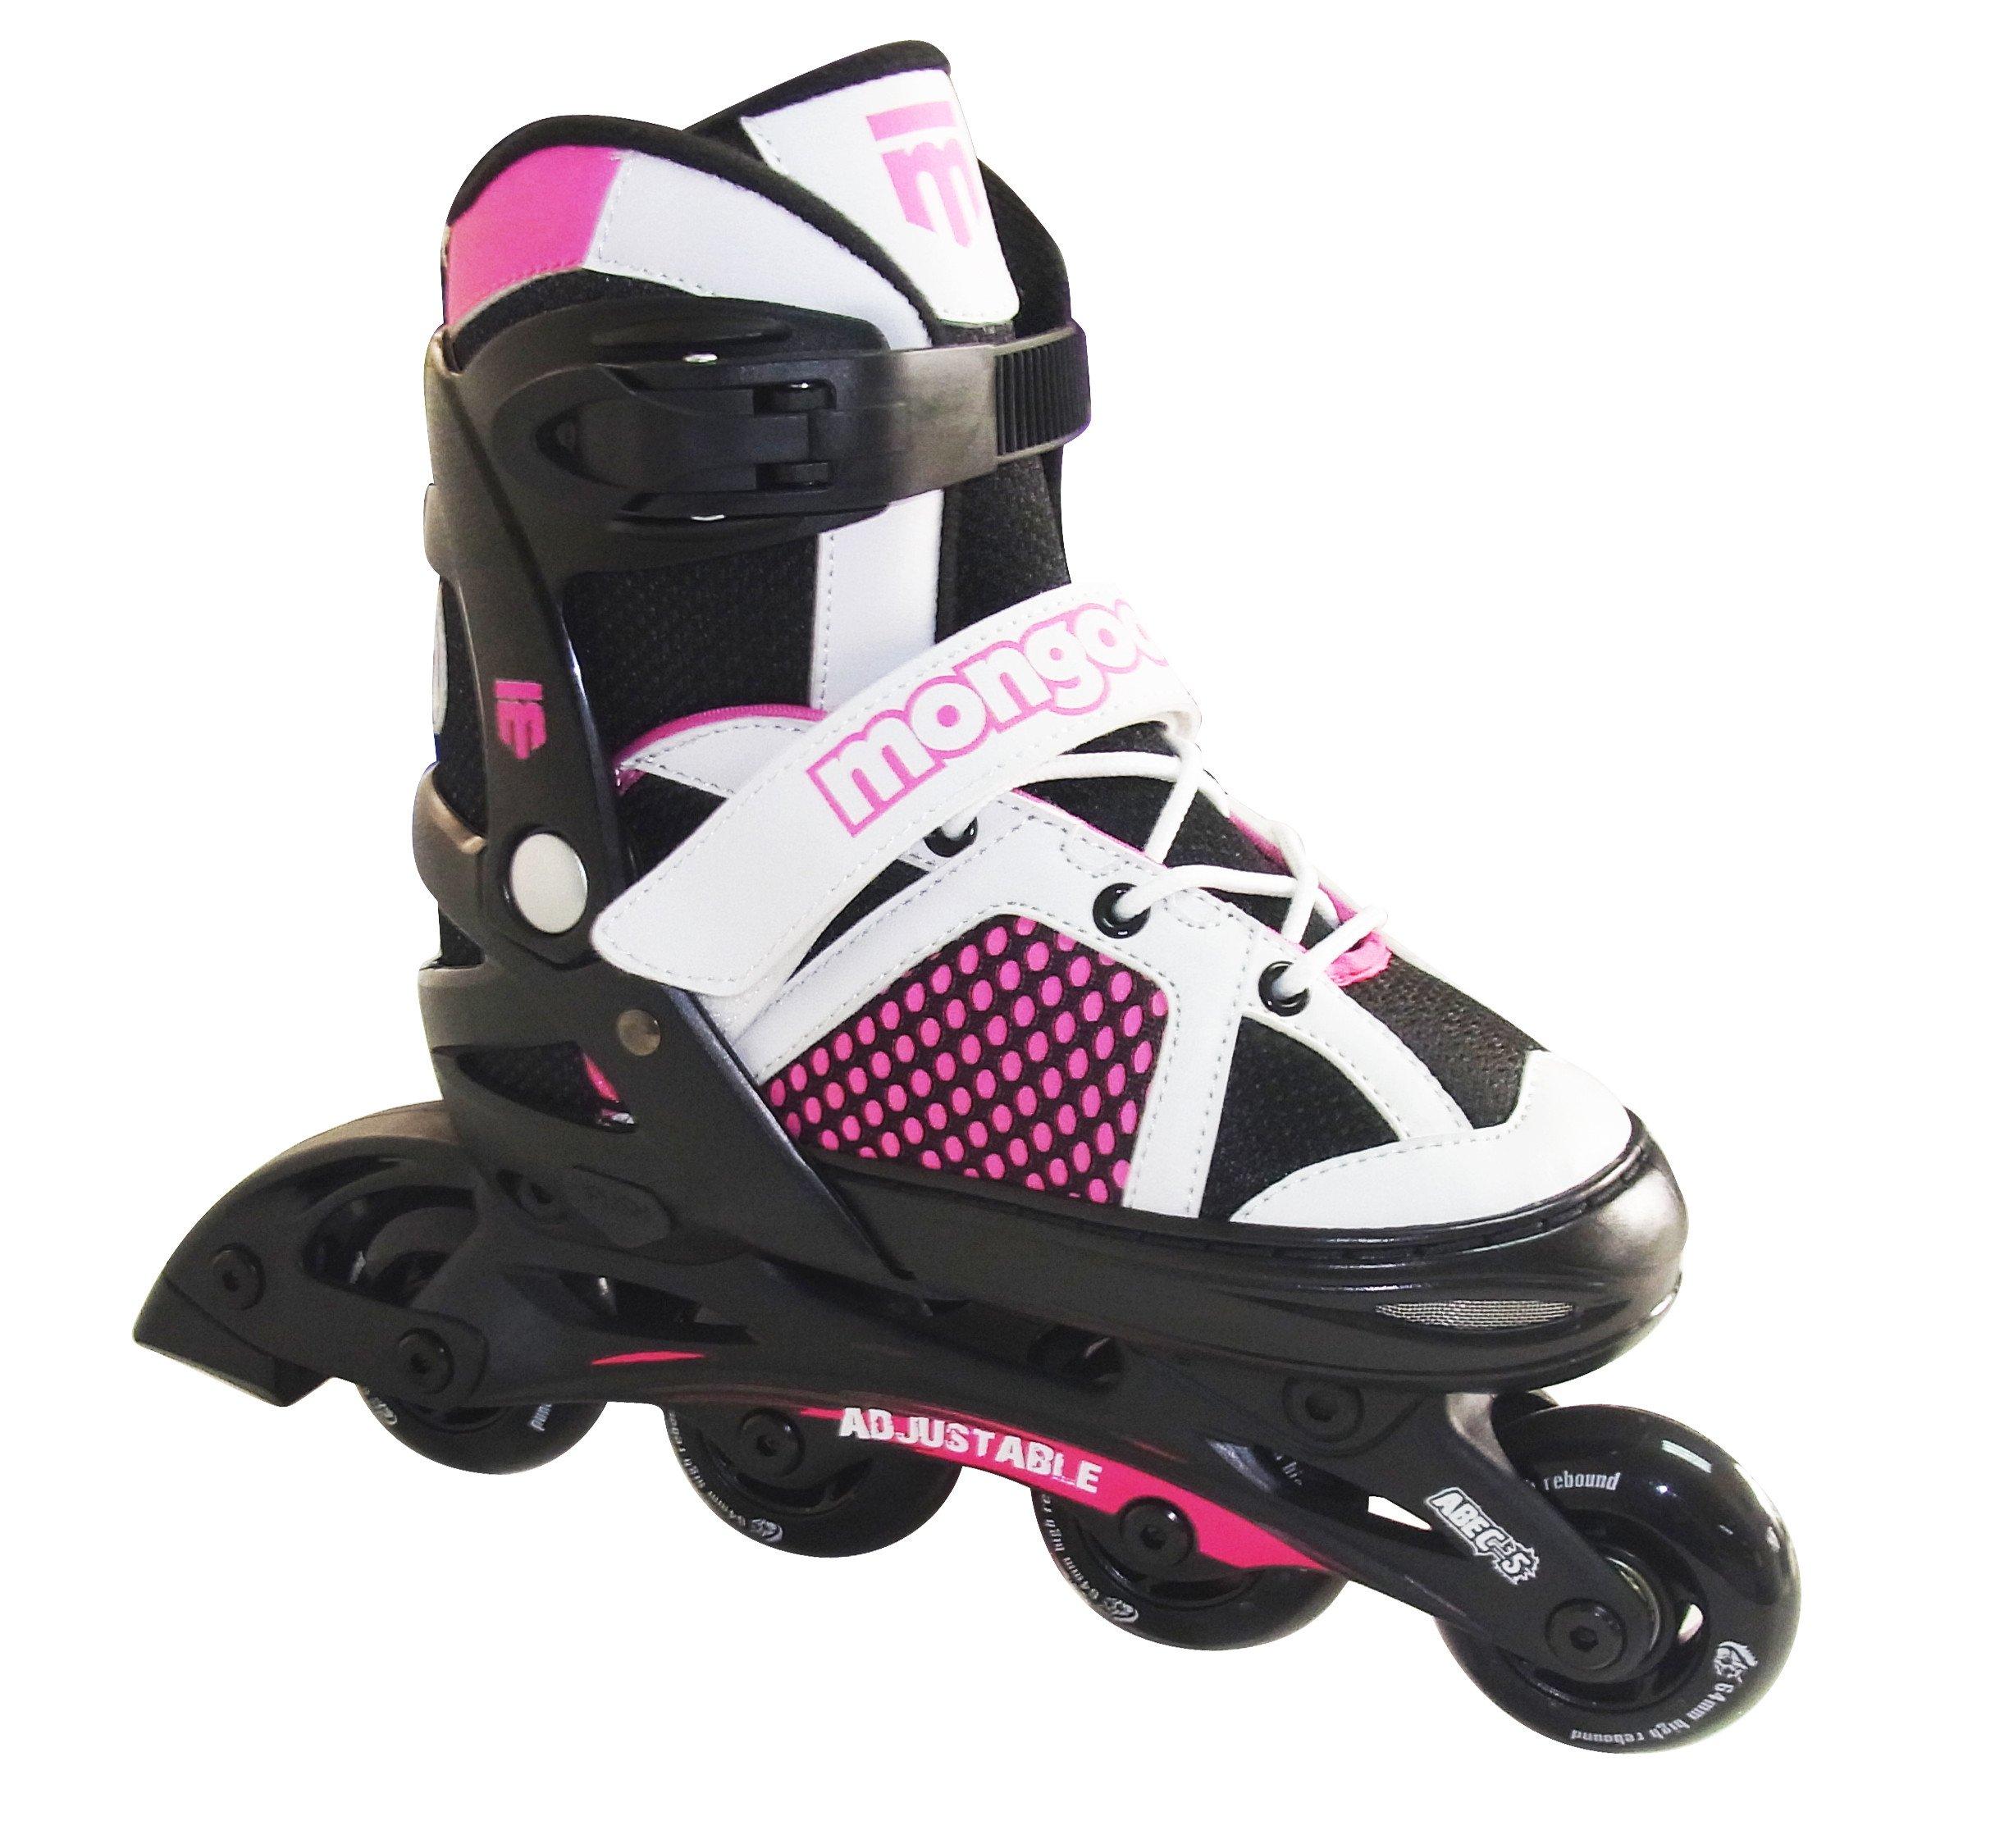 Mongoose Girl's Inline Skates, Small